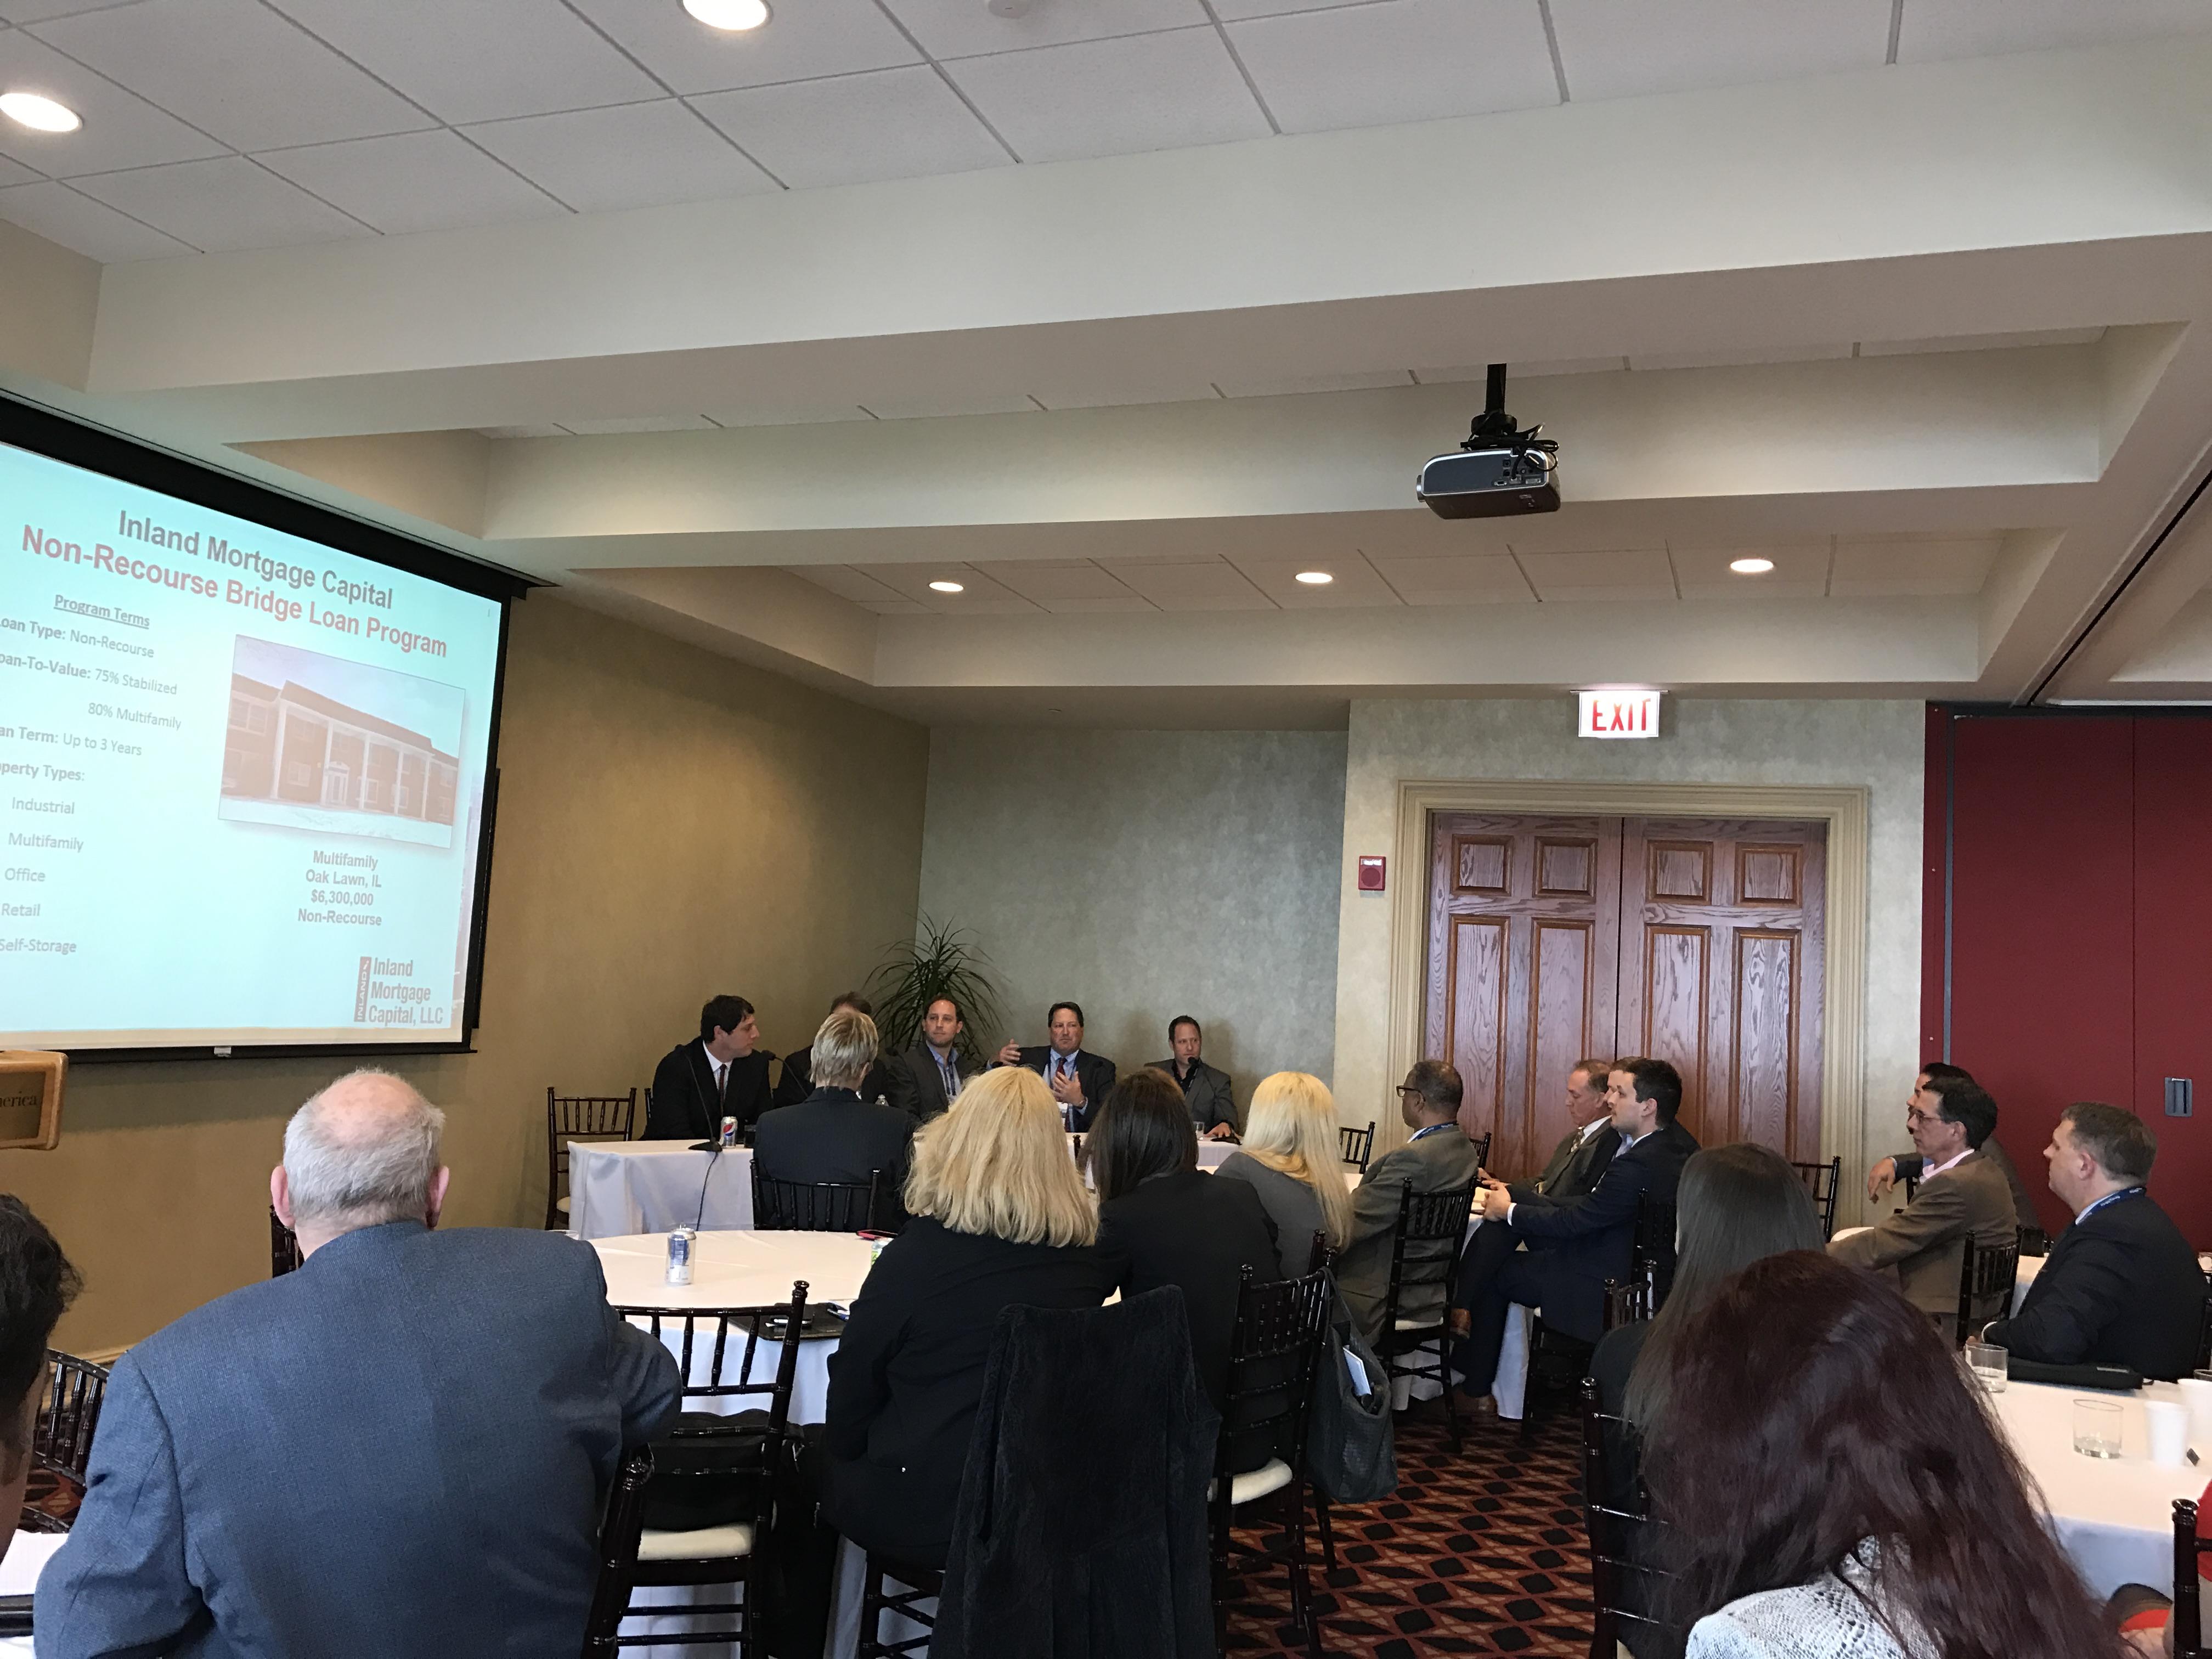 President of Inland Mortgage Capital, Art Rendak, speaks at